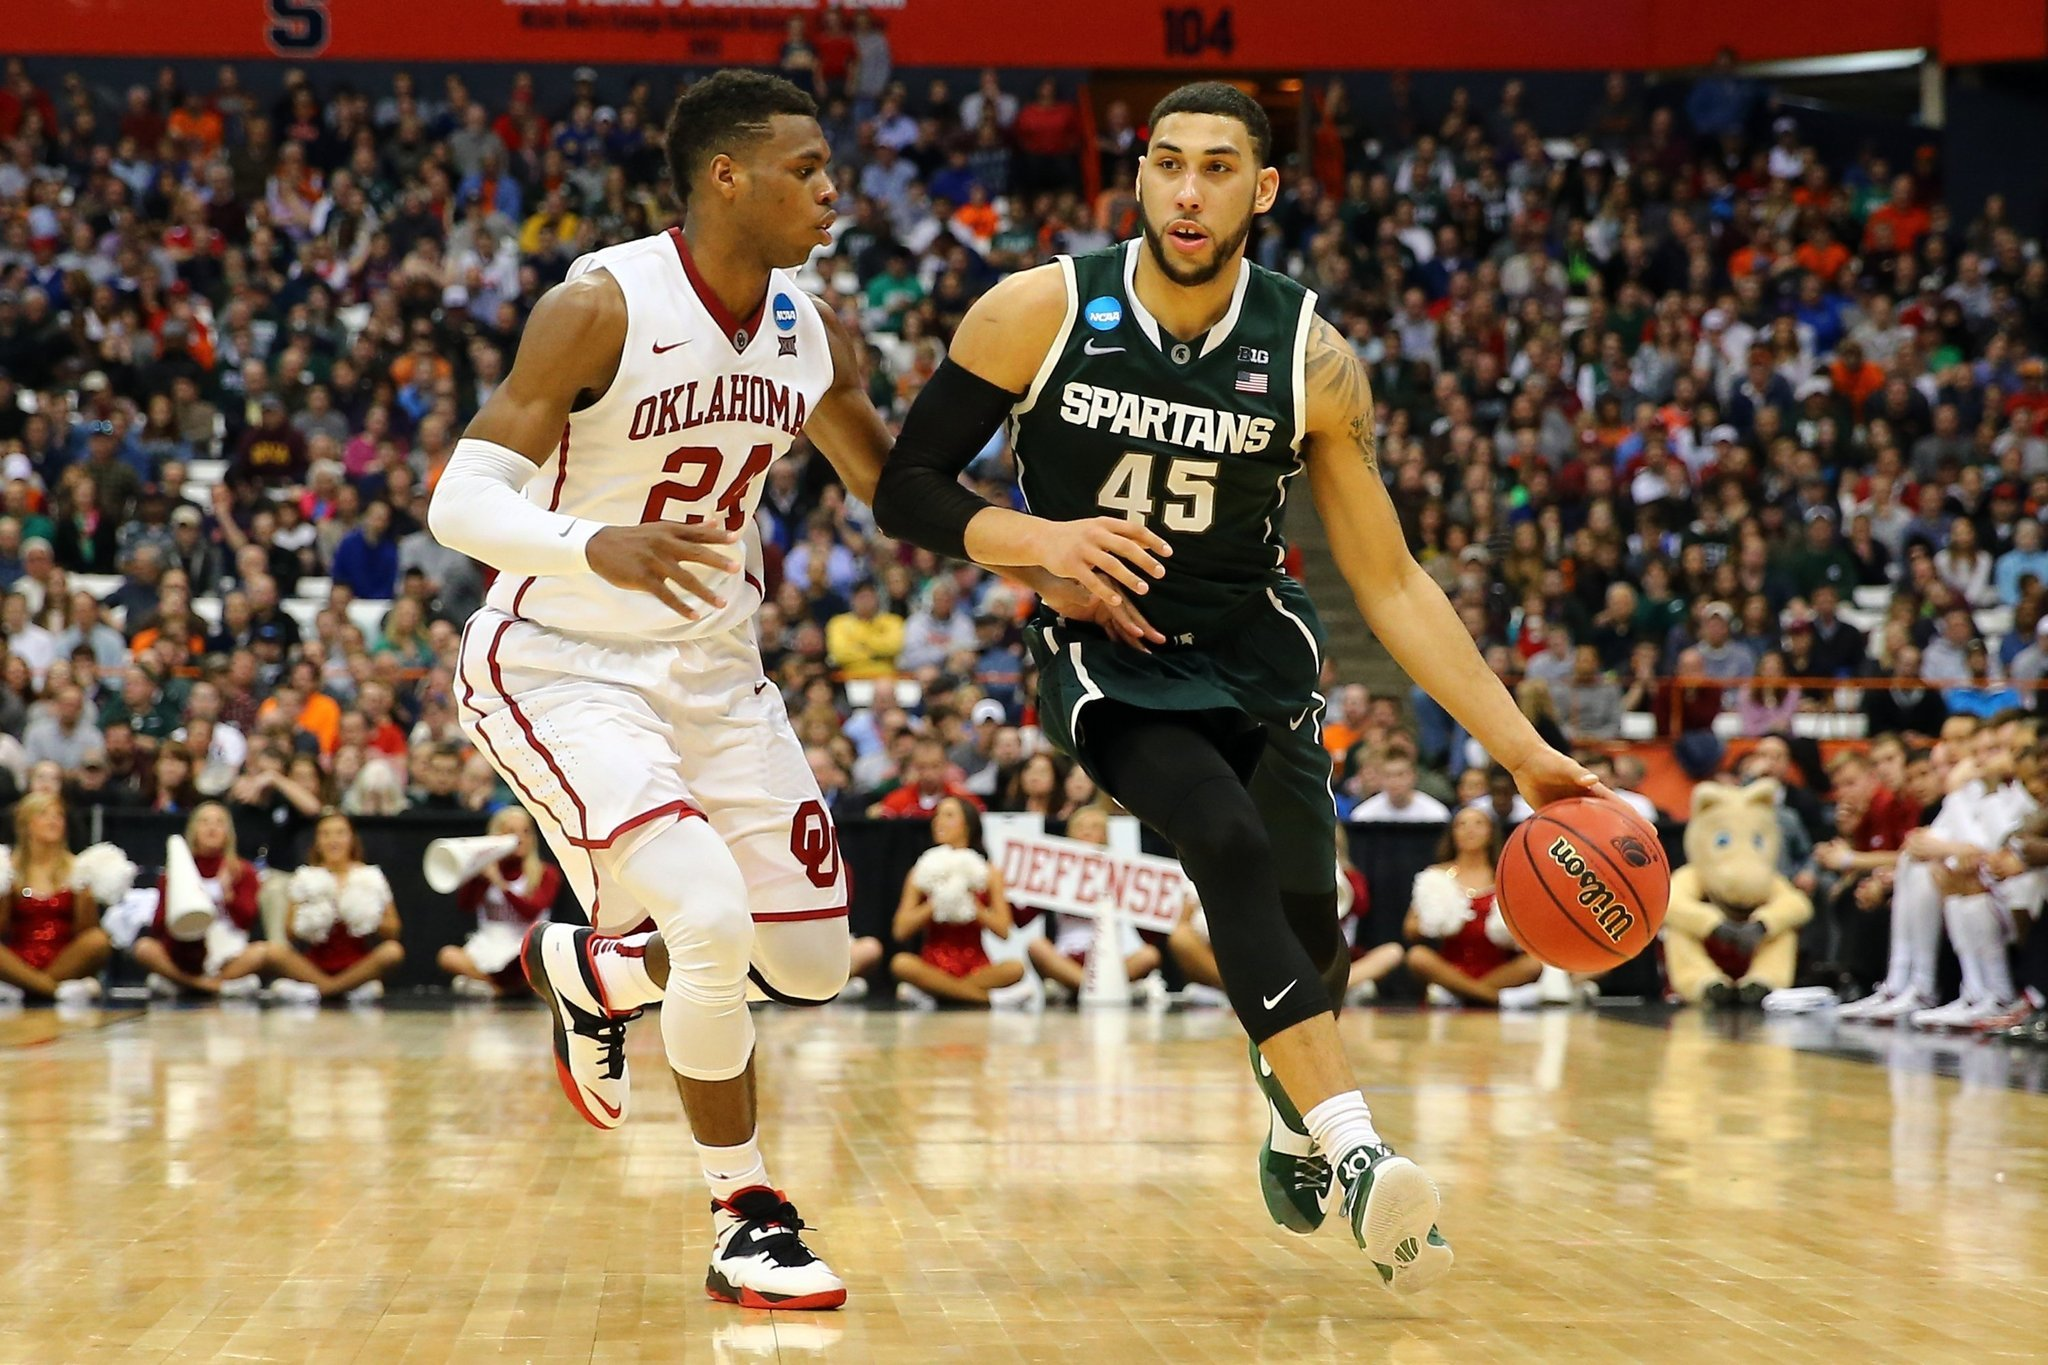 Michigan Stateu0027s Denzel Valentine Has NBA Potential, Analysts Say   Chicago  Tribune